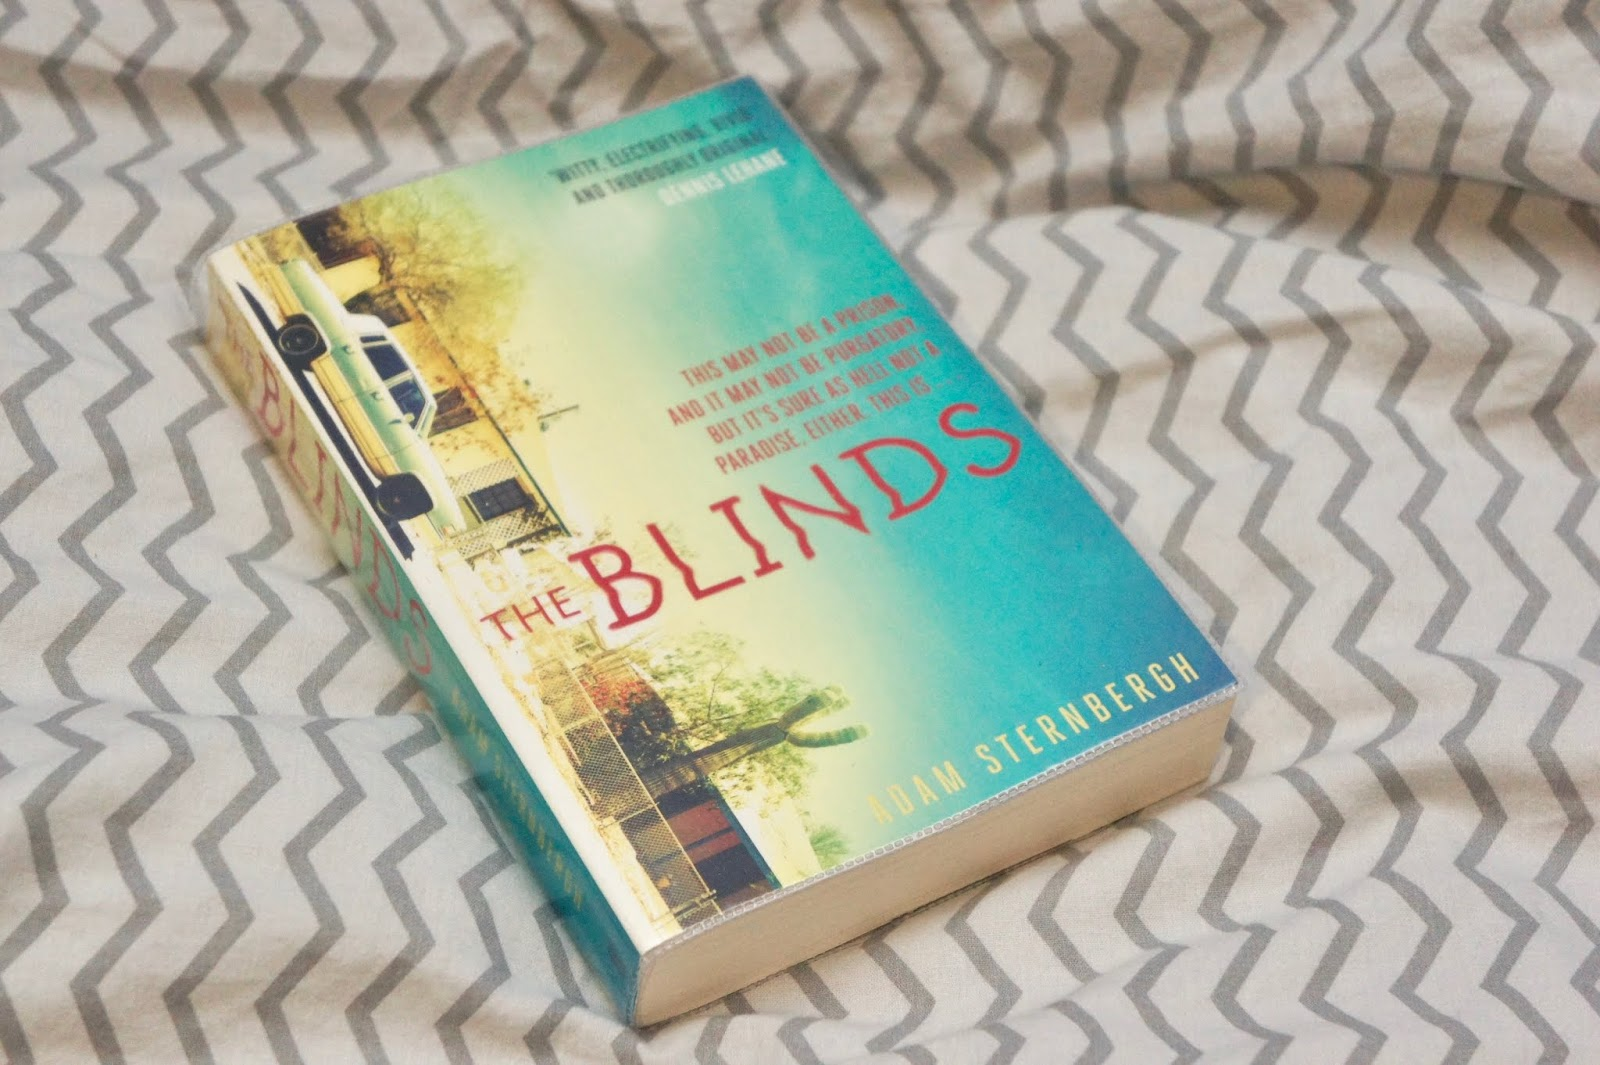 the blinds adam sternbergh